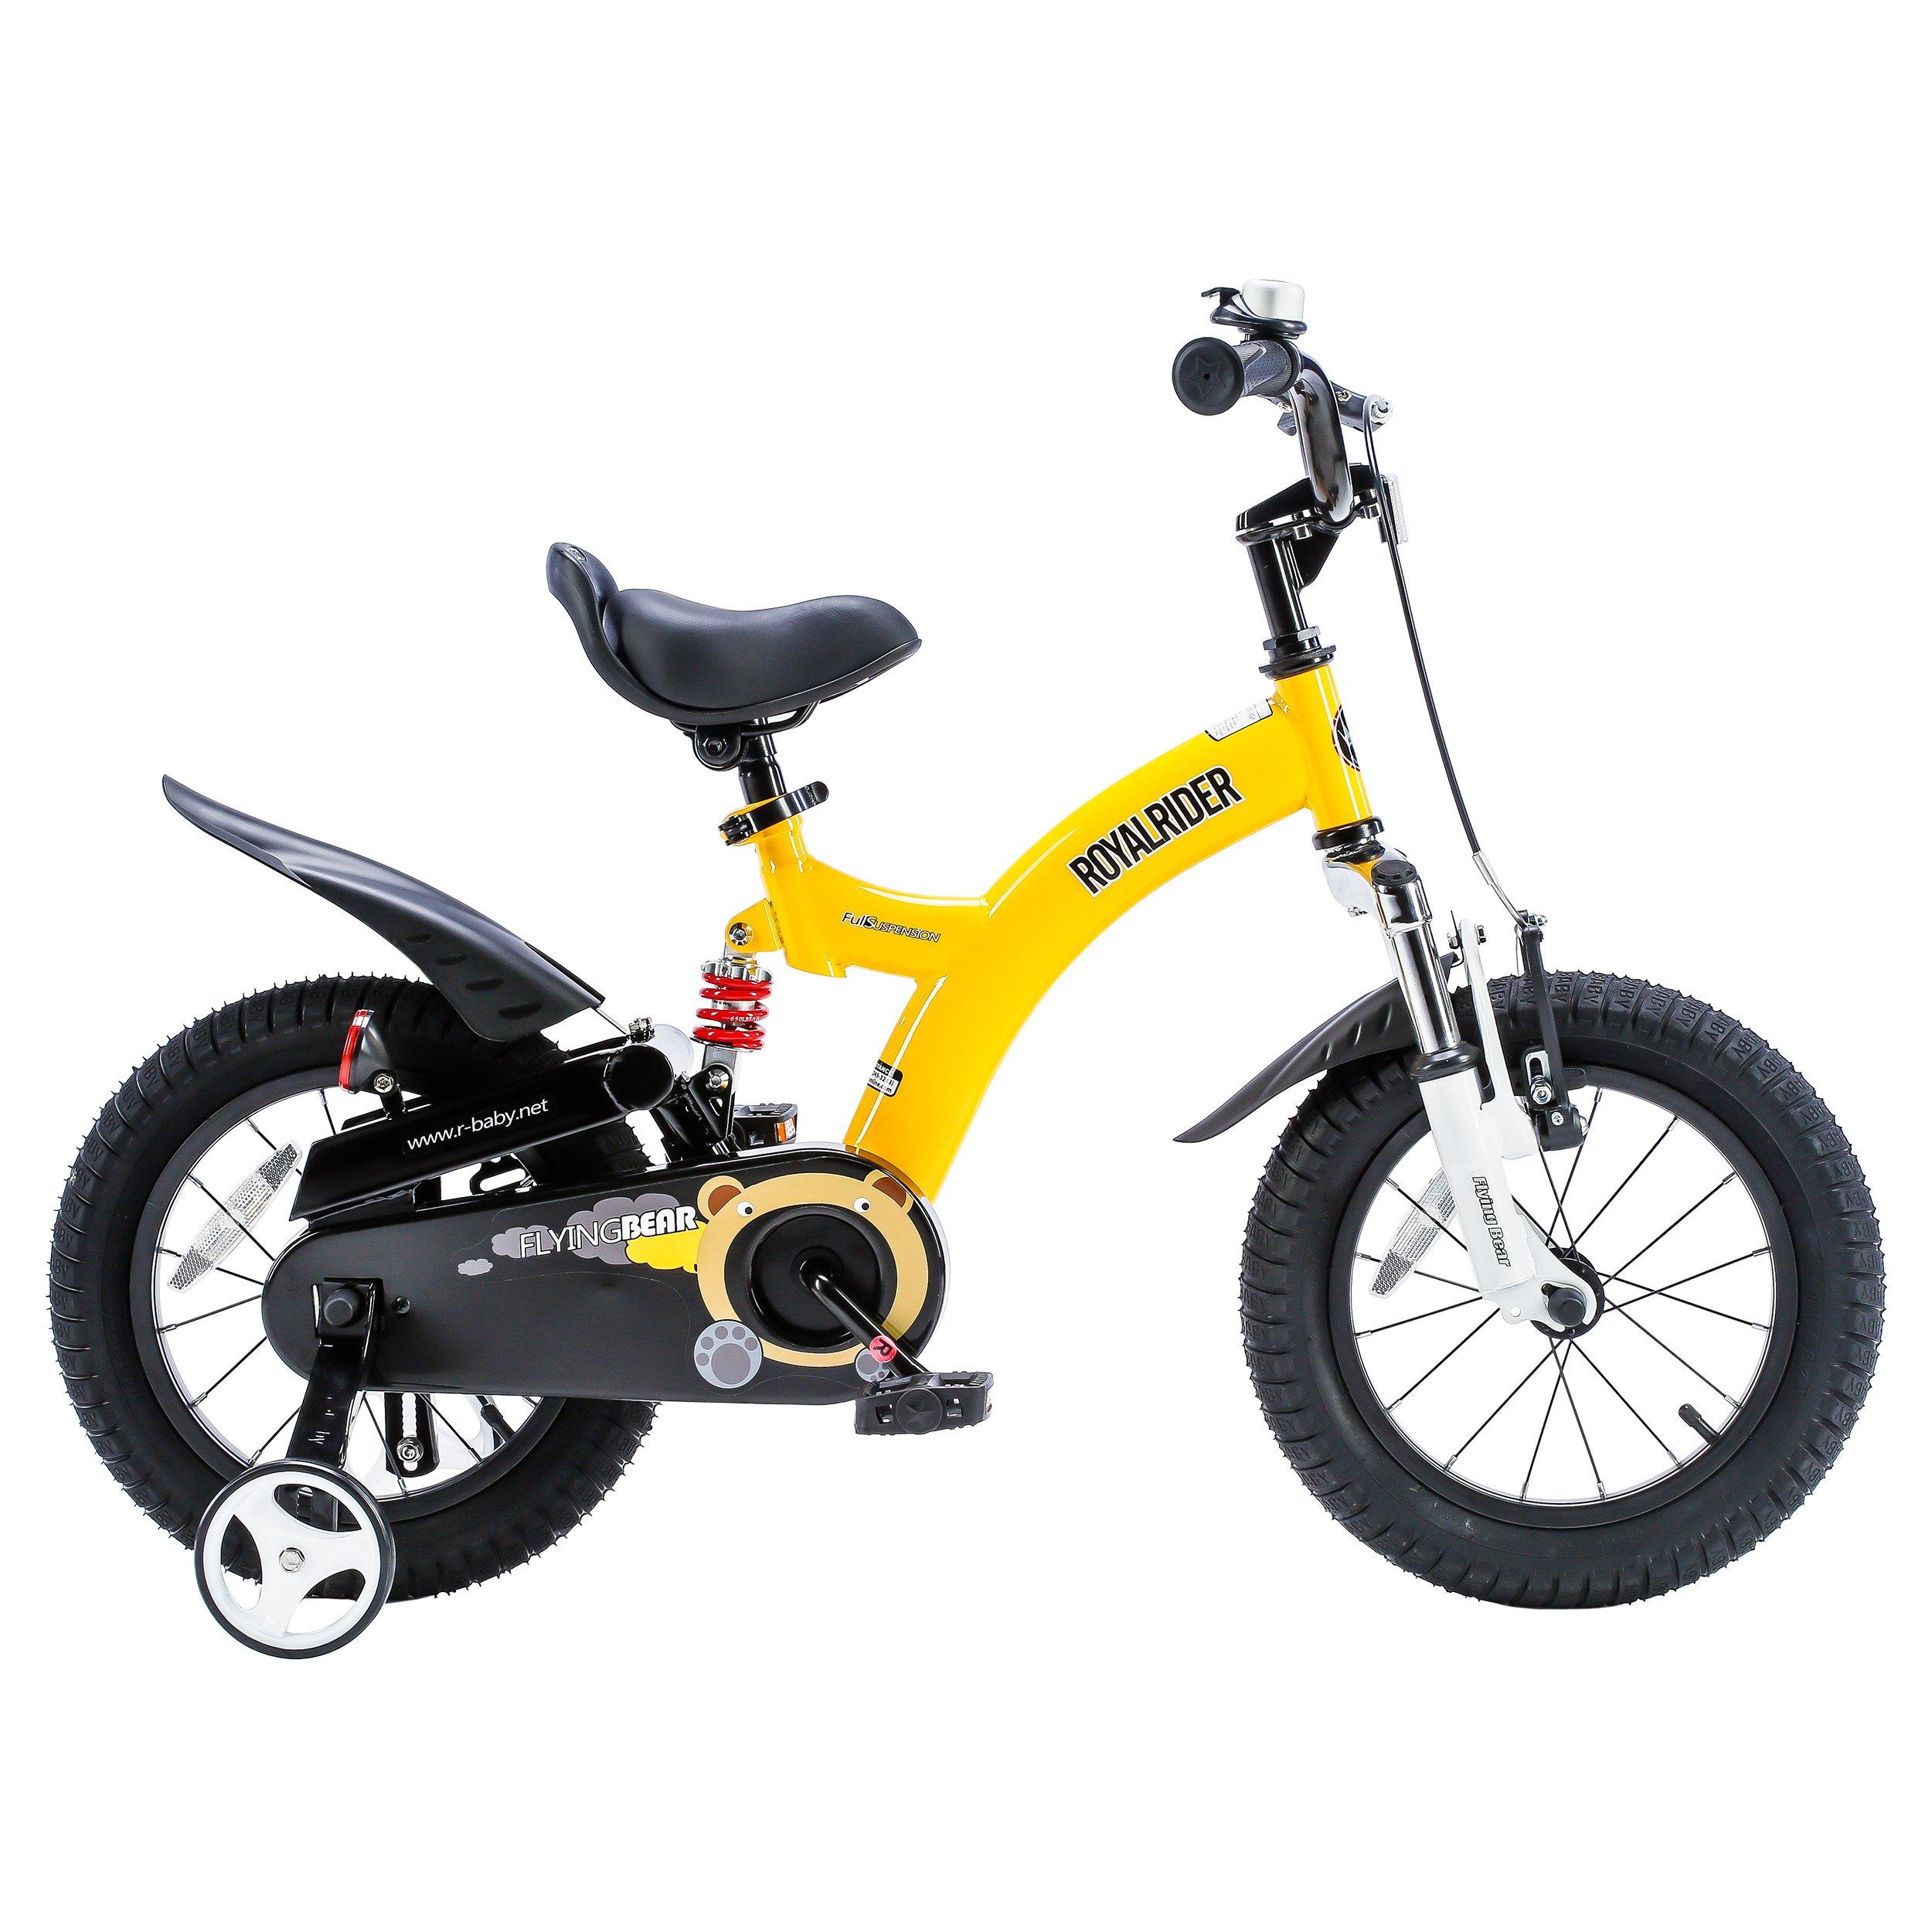 Royalbaby Flying Bear Full Suspension Kids Bike Perfect Gift for Kids, Boys Bike, Girls Bike, Sport Bike, 12 Inch Wheels, Yellow by Royalbaby